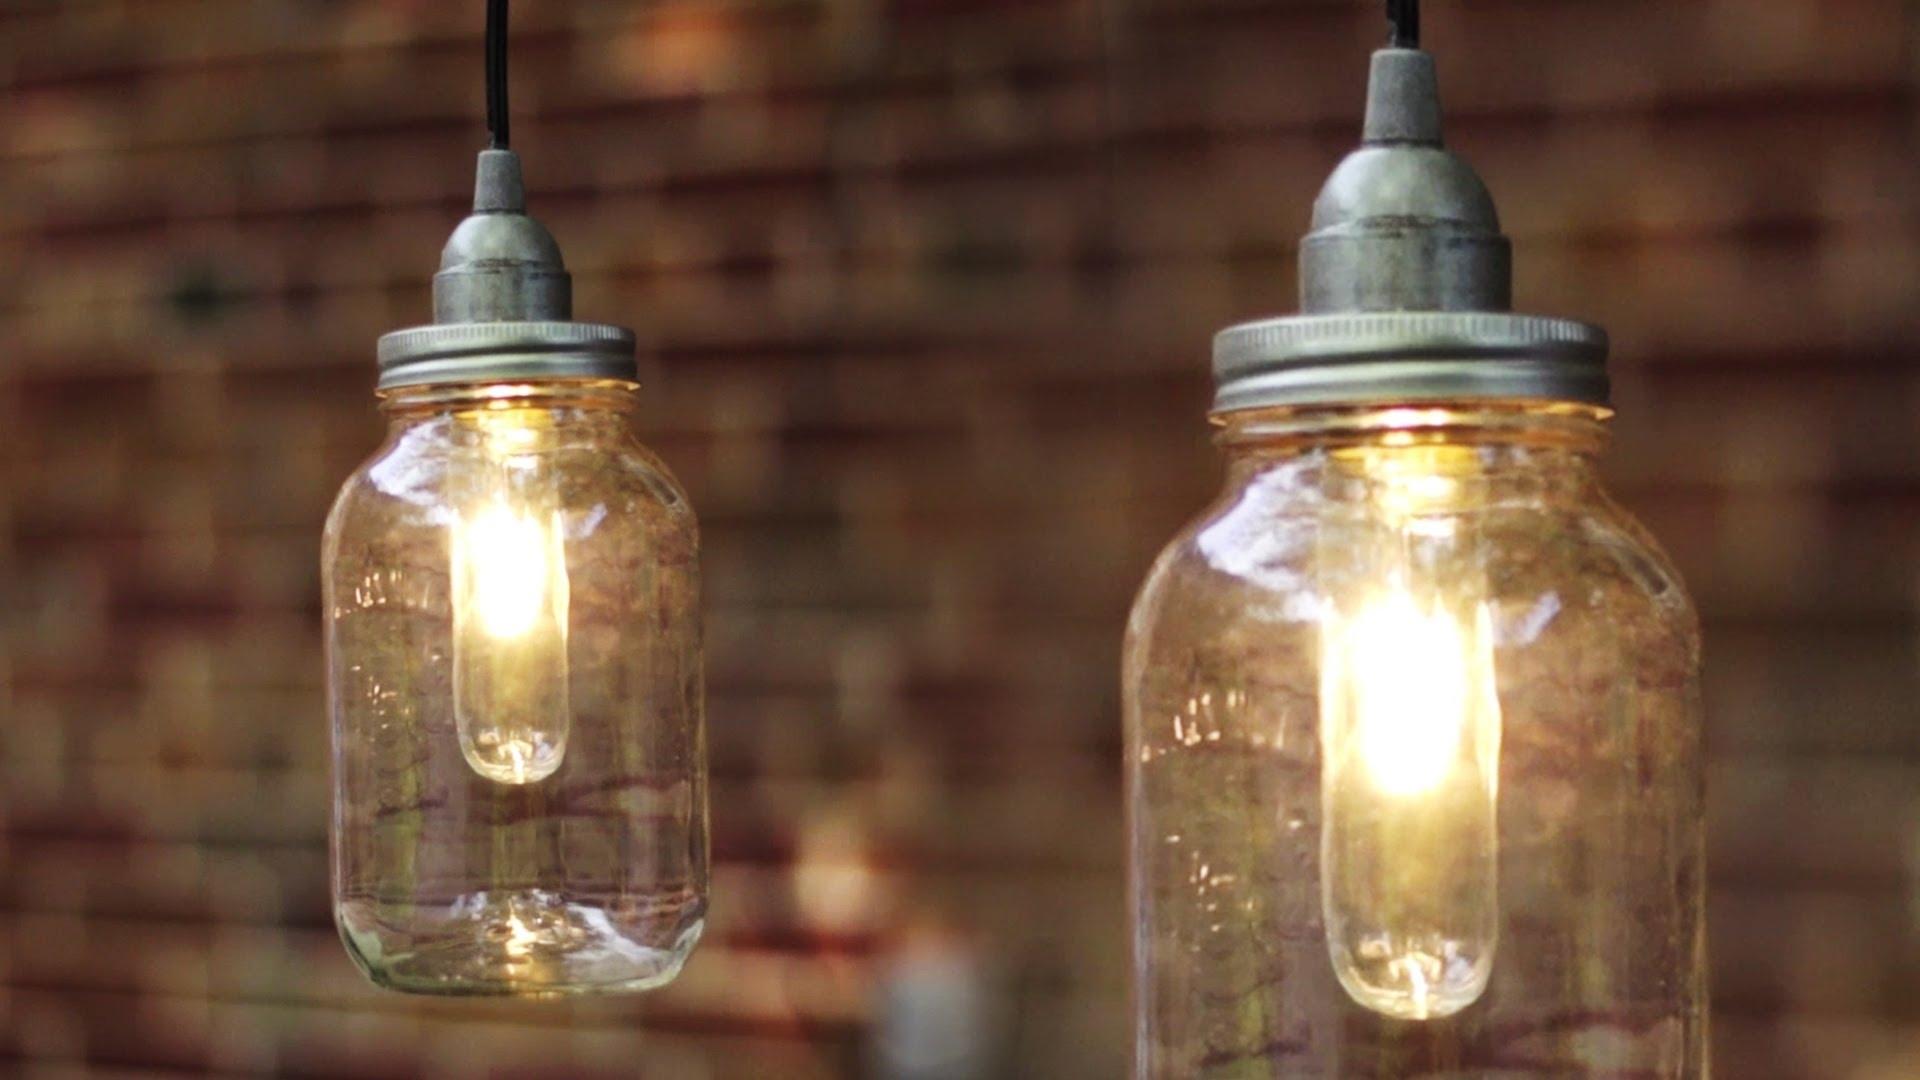 Diy Mason Jar Light / Lantern – Youtube In Outdoor Hanging Mason Jar Lights (View 2 of 15)